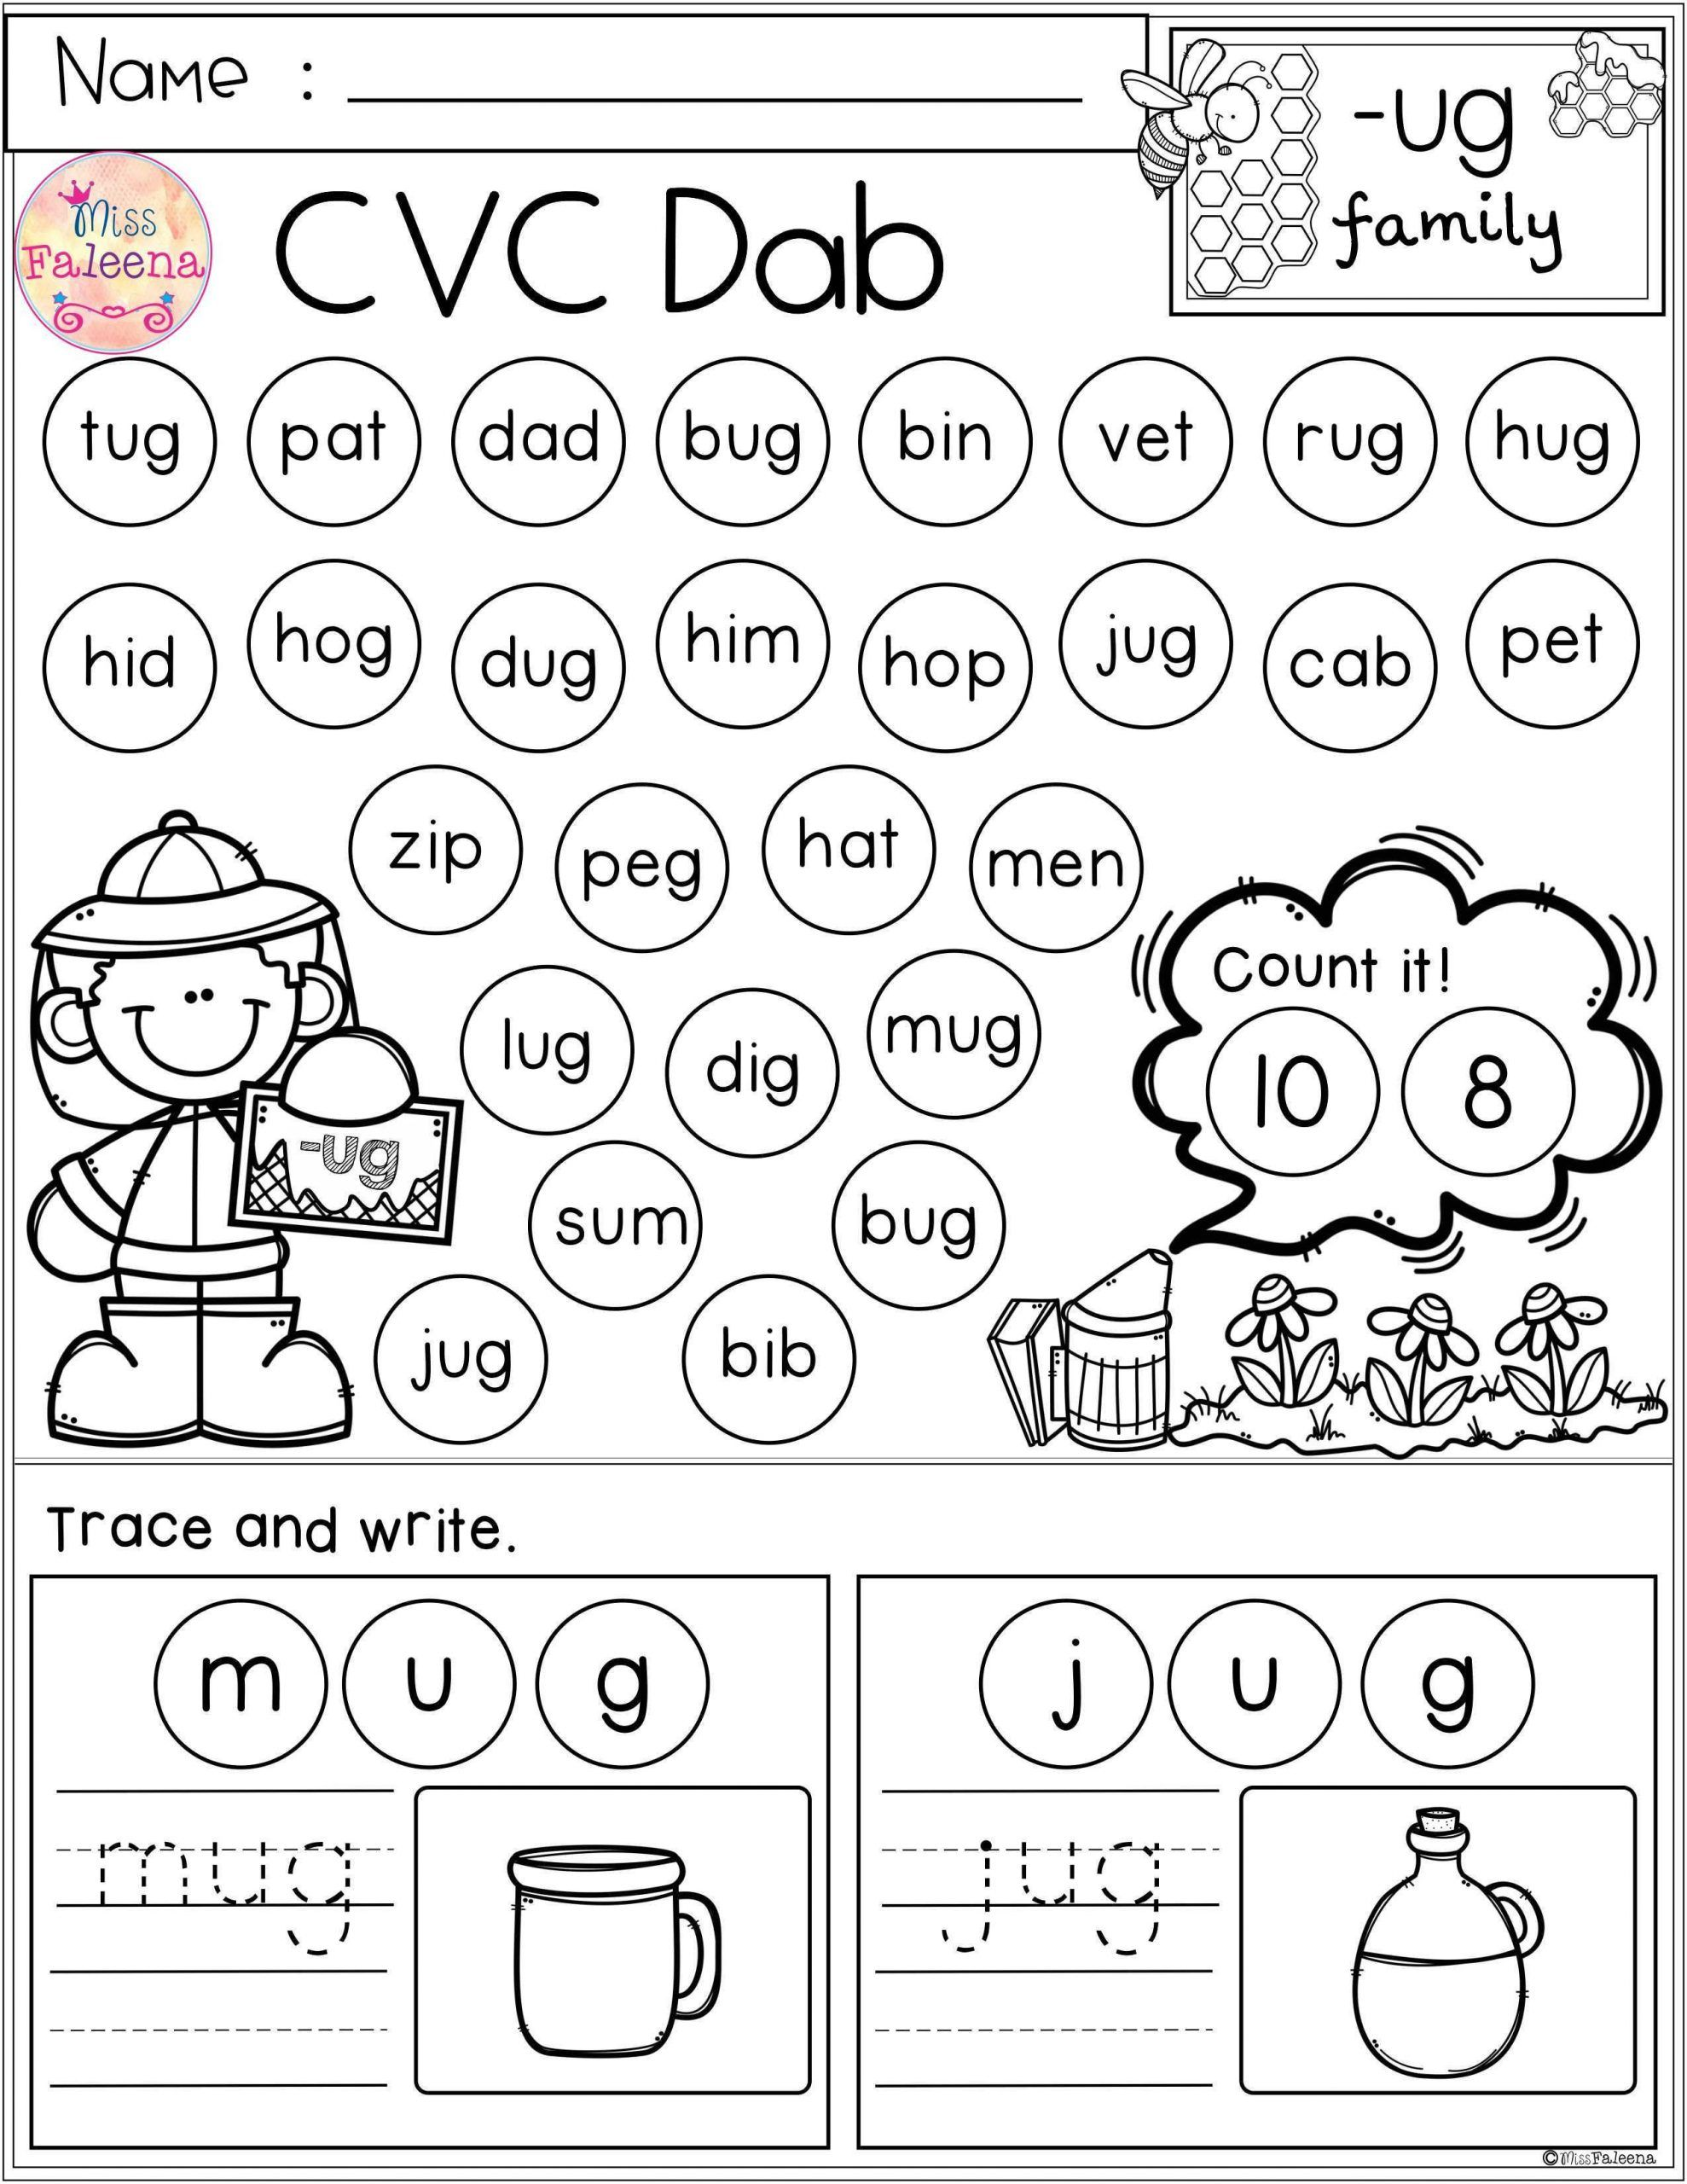 Free Cvc Worksheets For Kindergarten In